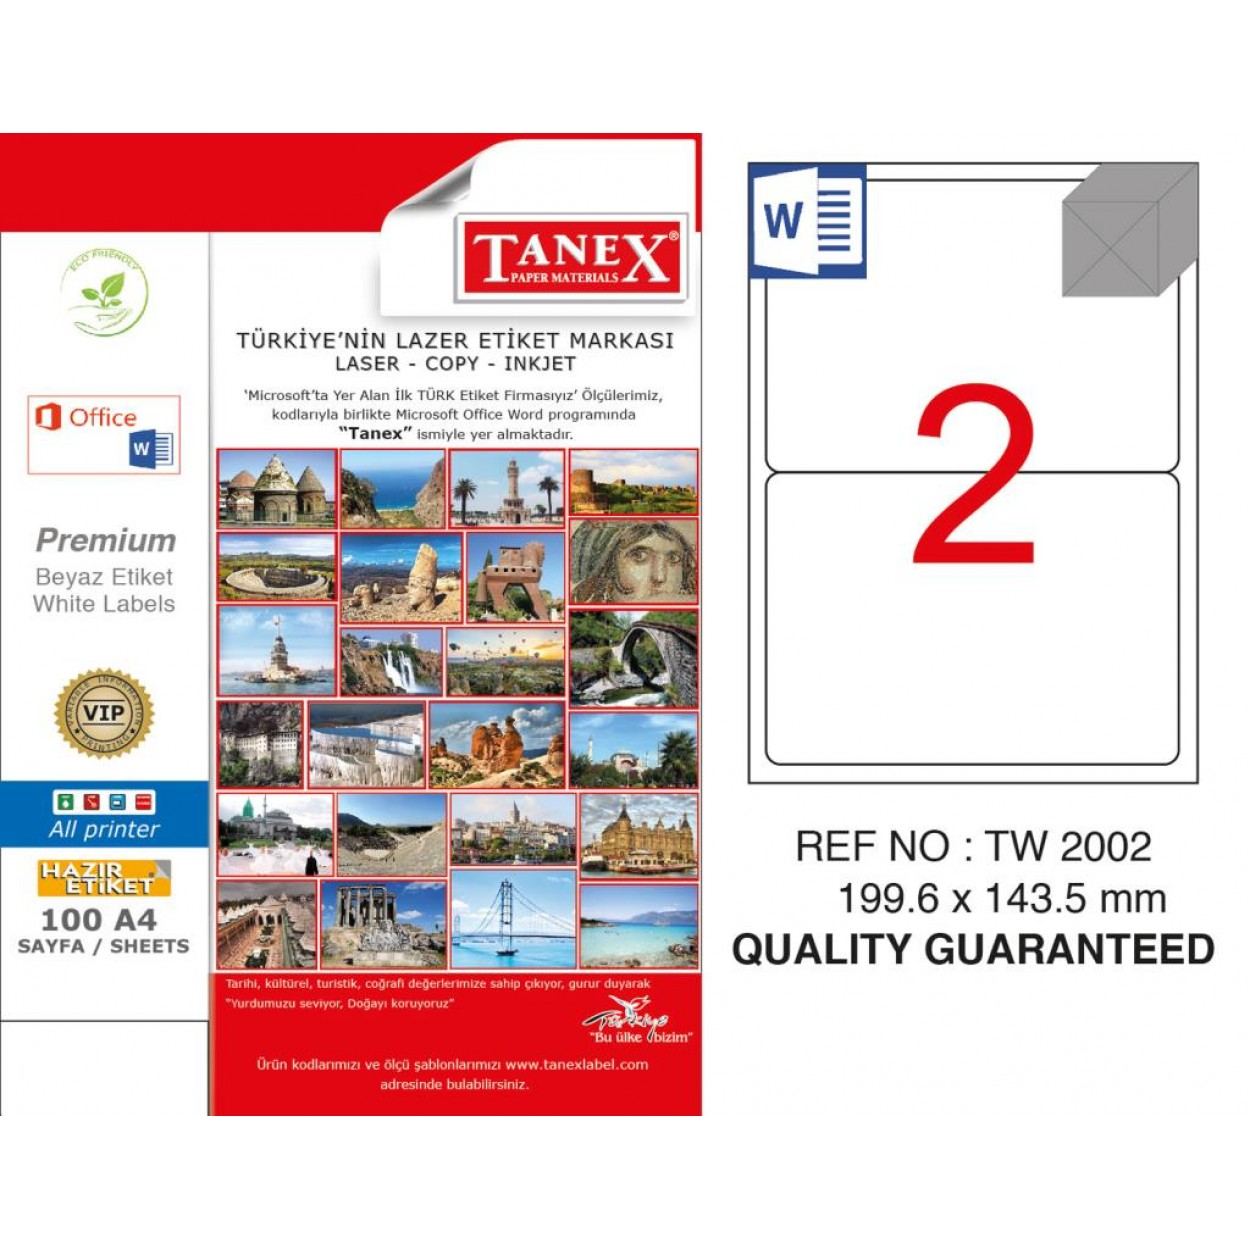 Tanex TW-2002 199.6x143.5mm Şeffaf Laser Etiket 50 Li